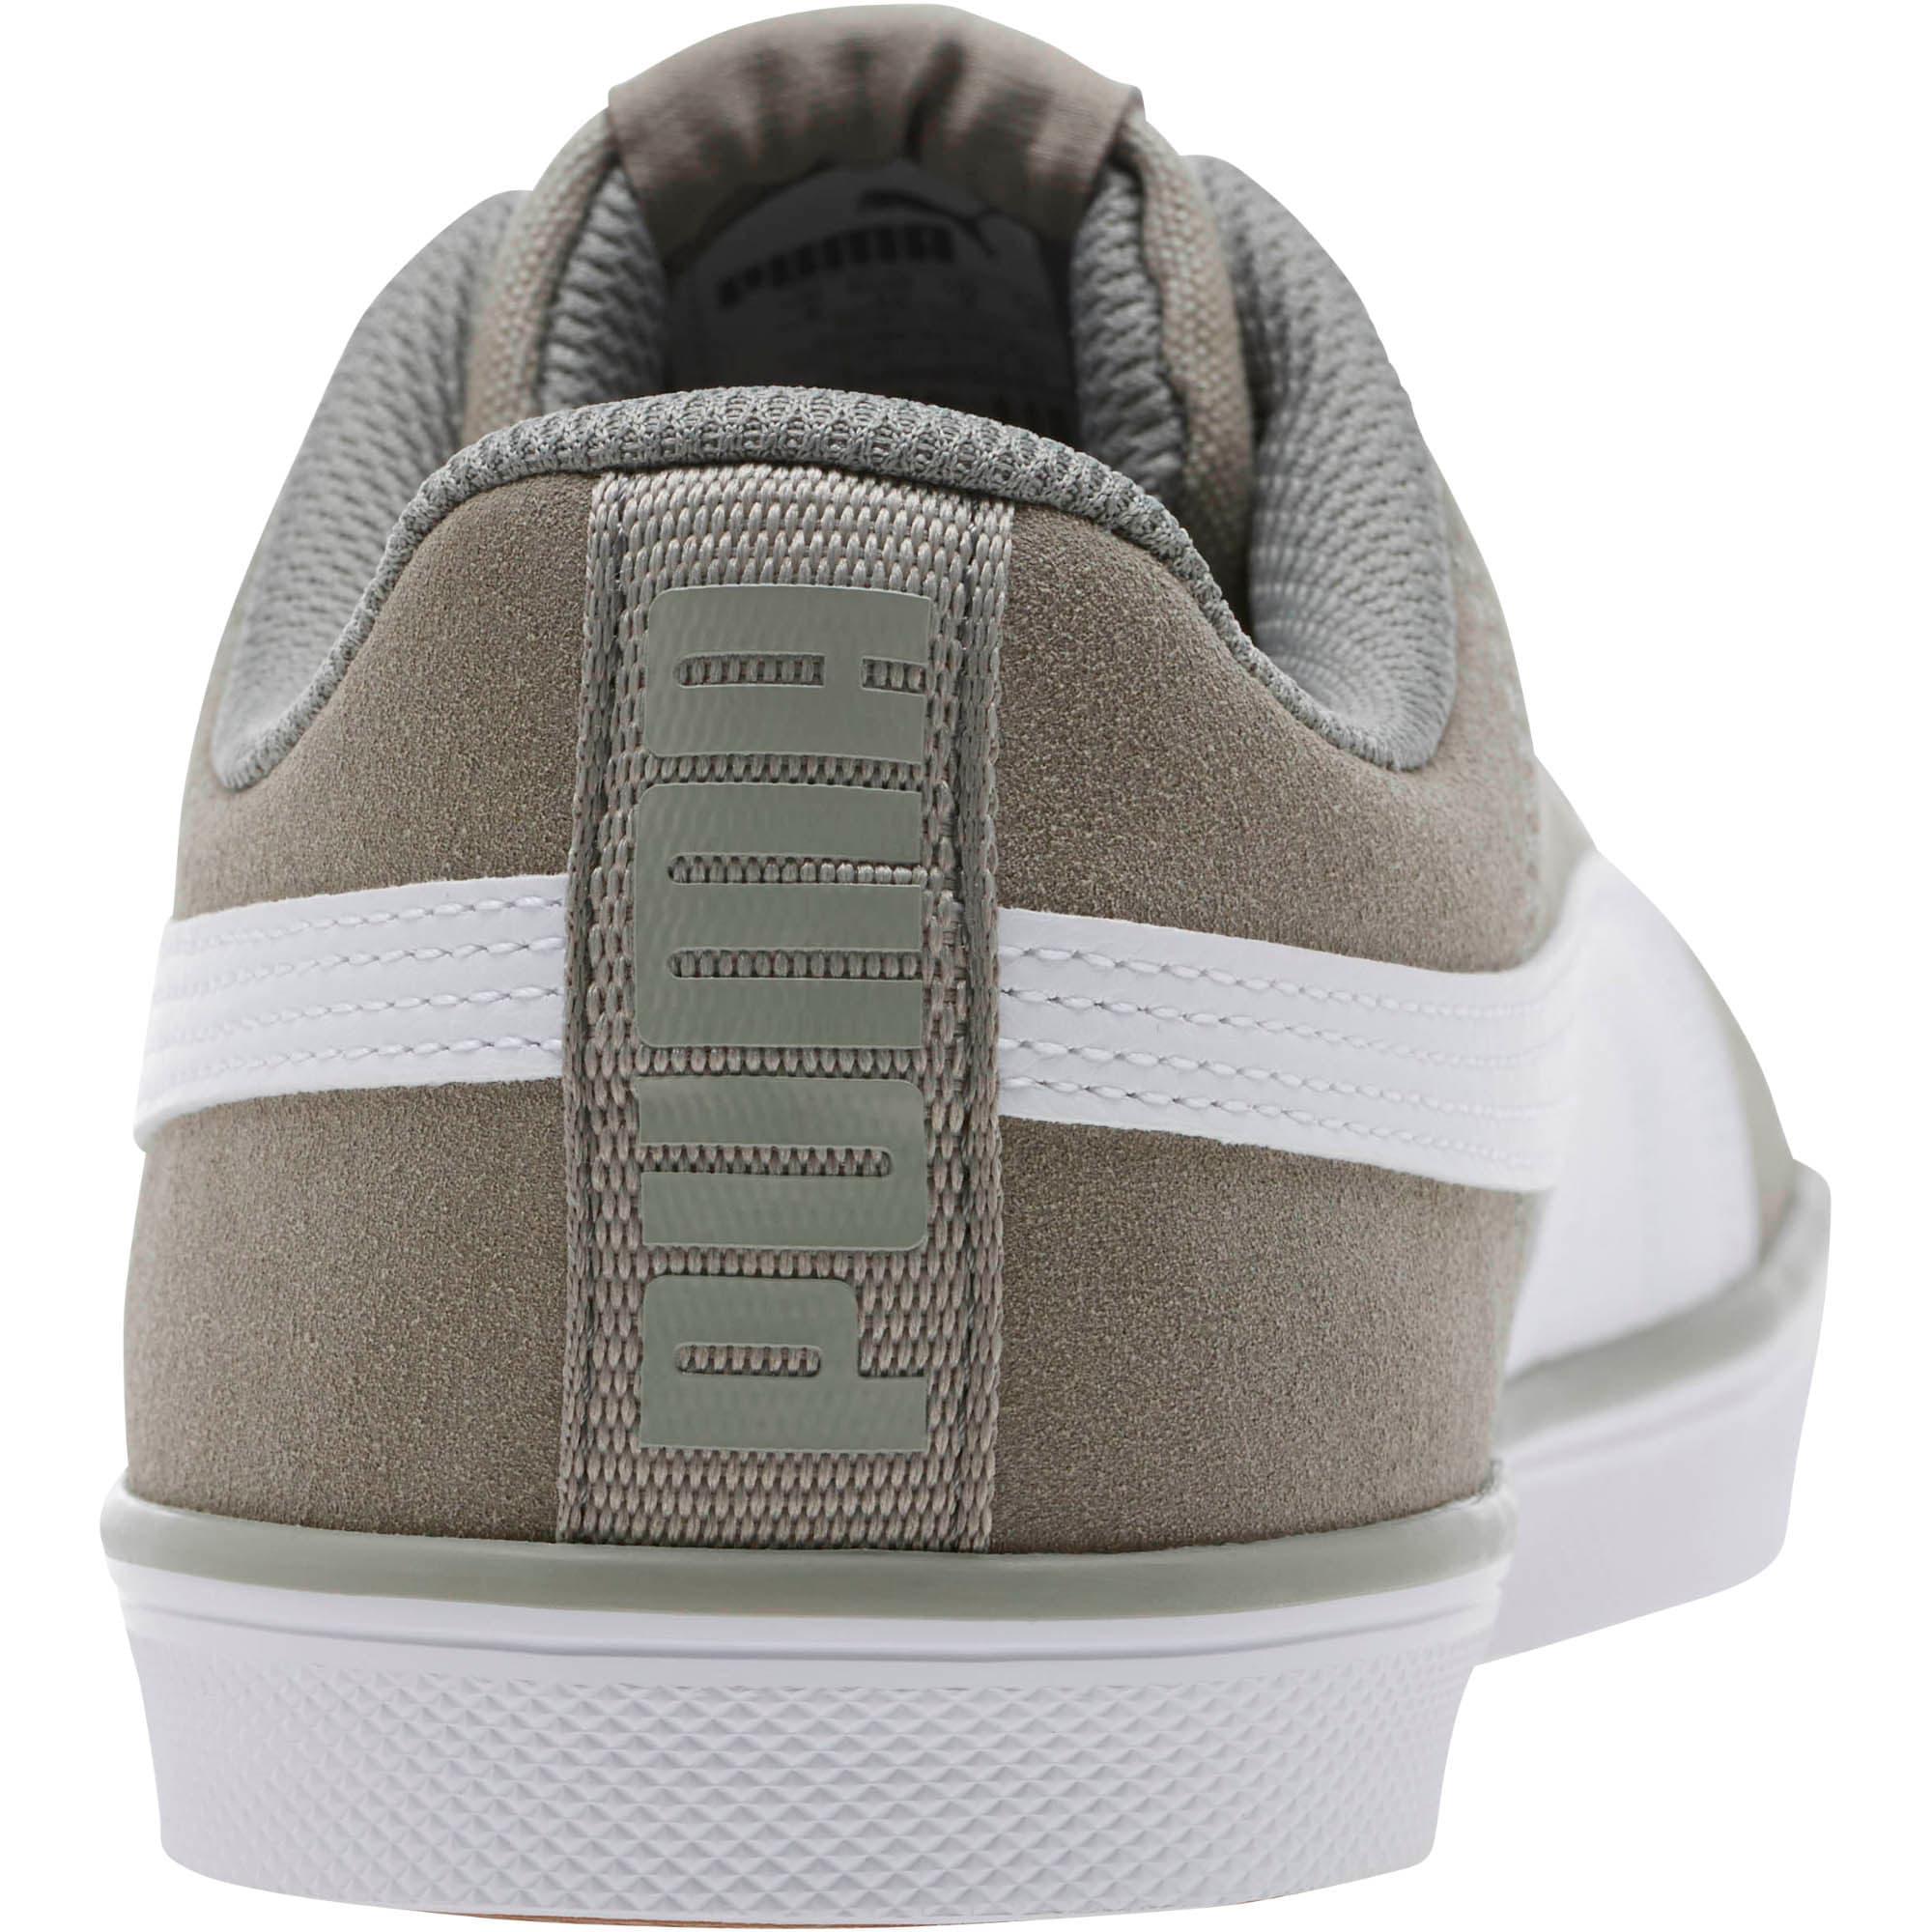 Thumbnail 4 of Urban Plus Suede Sneakers, Rock Ridge-Puma White, medium